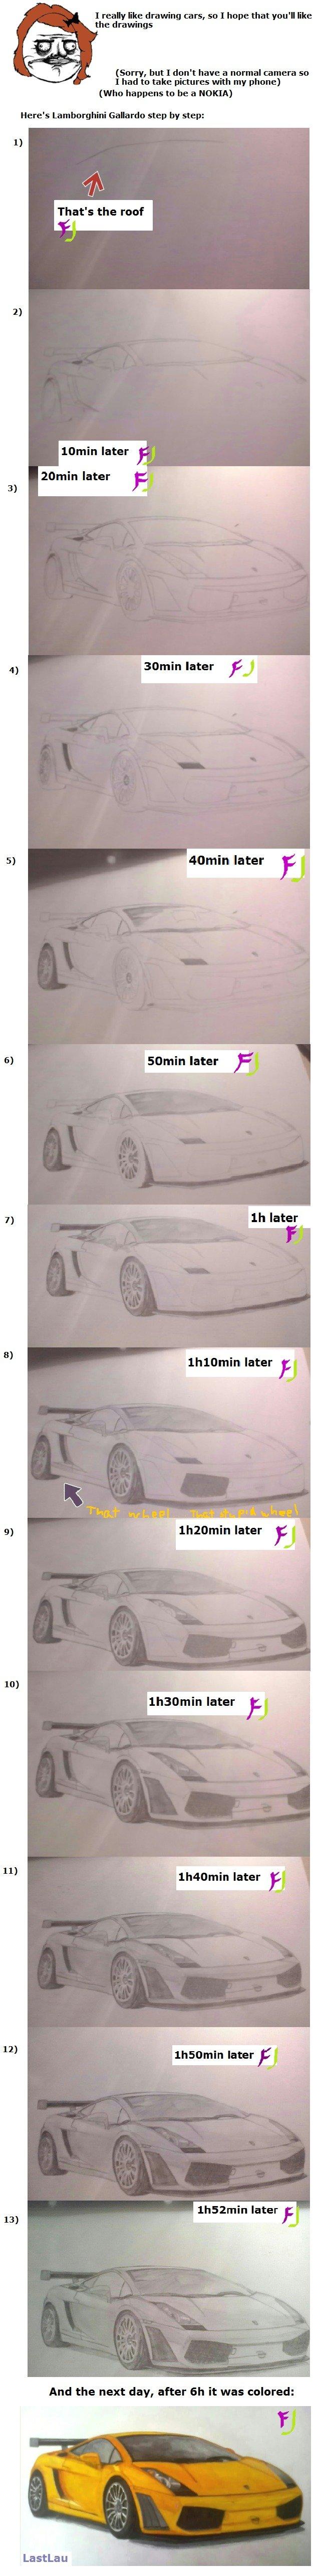 I like cars. I have a colored nissan GTR and a skech of dodge viper srt and a mitsubishi evo IX. I realy Ike drawing cars, so I hope that you' I Ike the drawing